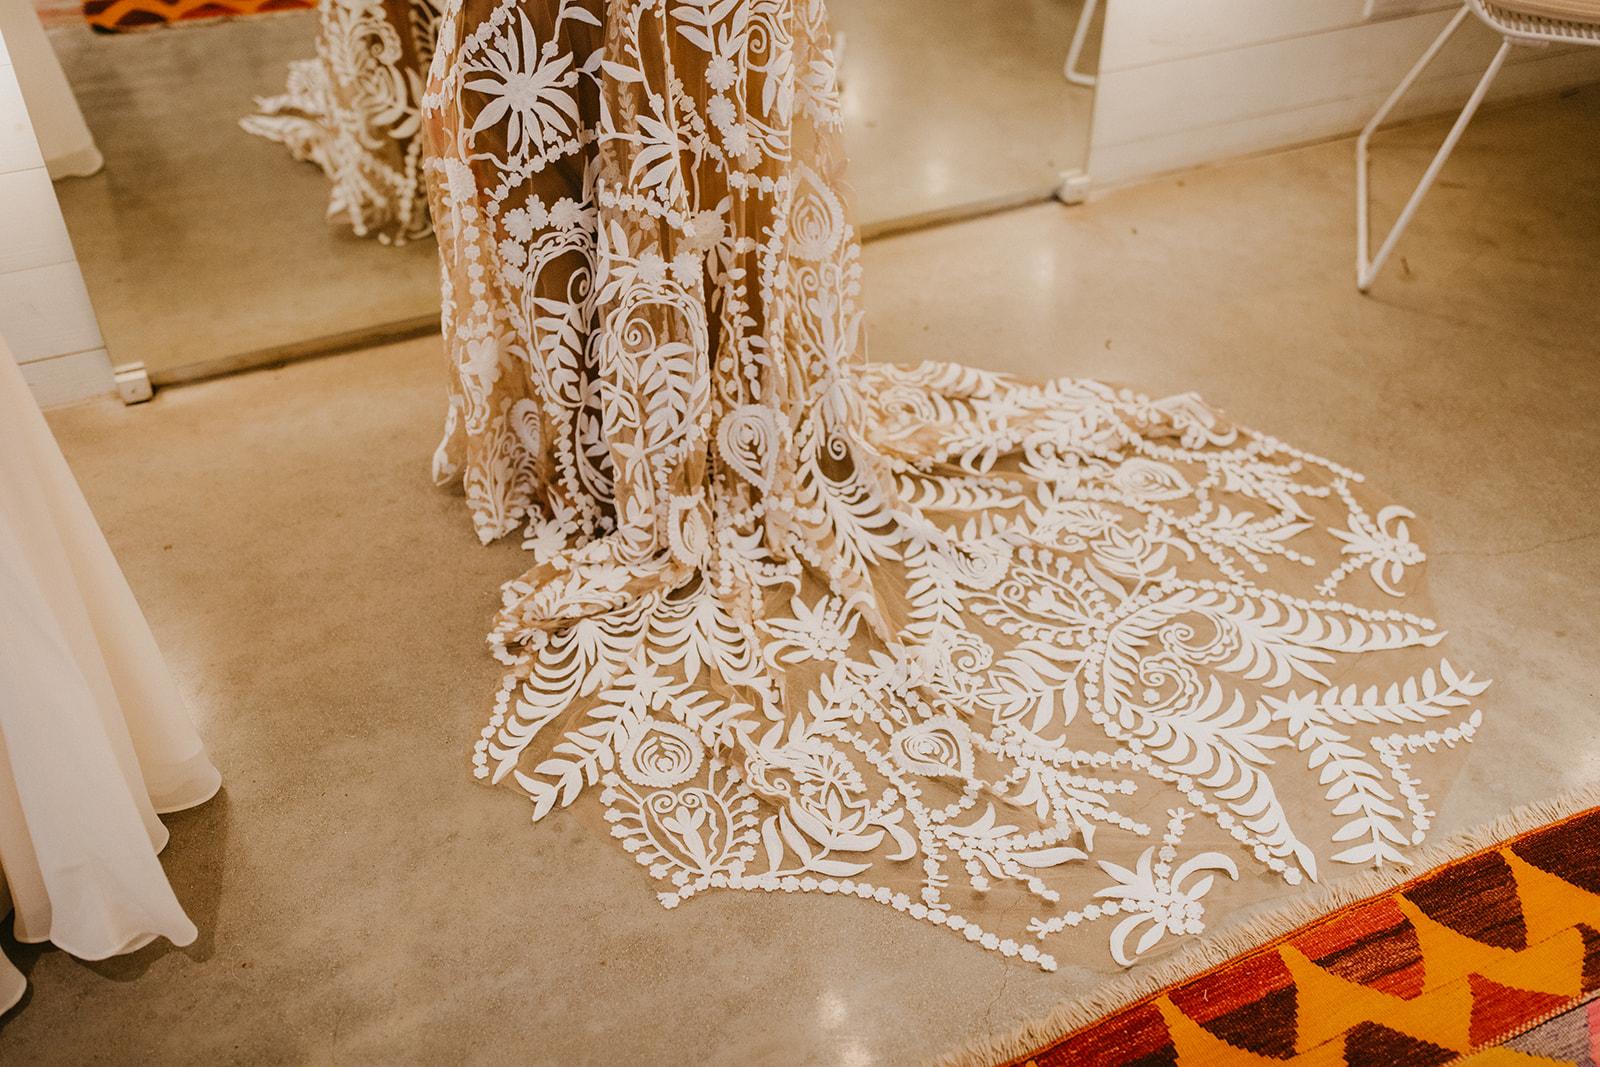 rue de seine wedding dress train with nude lining